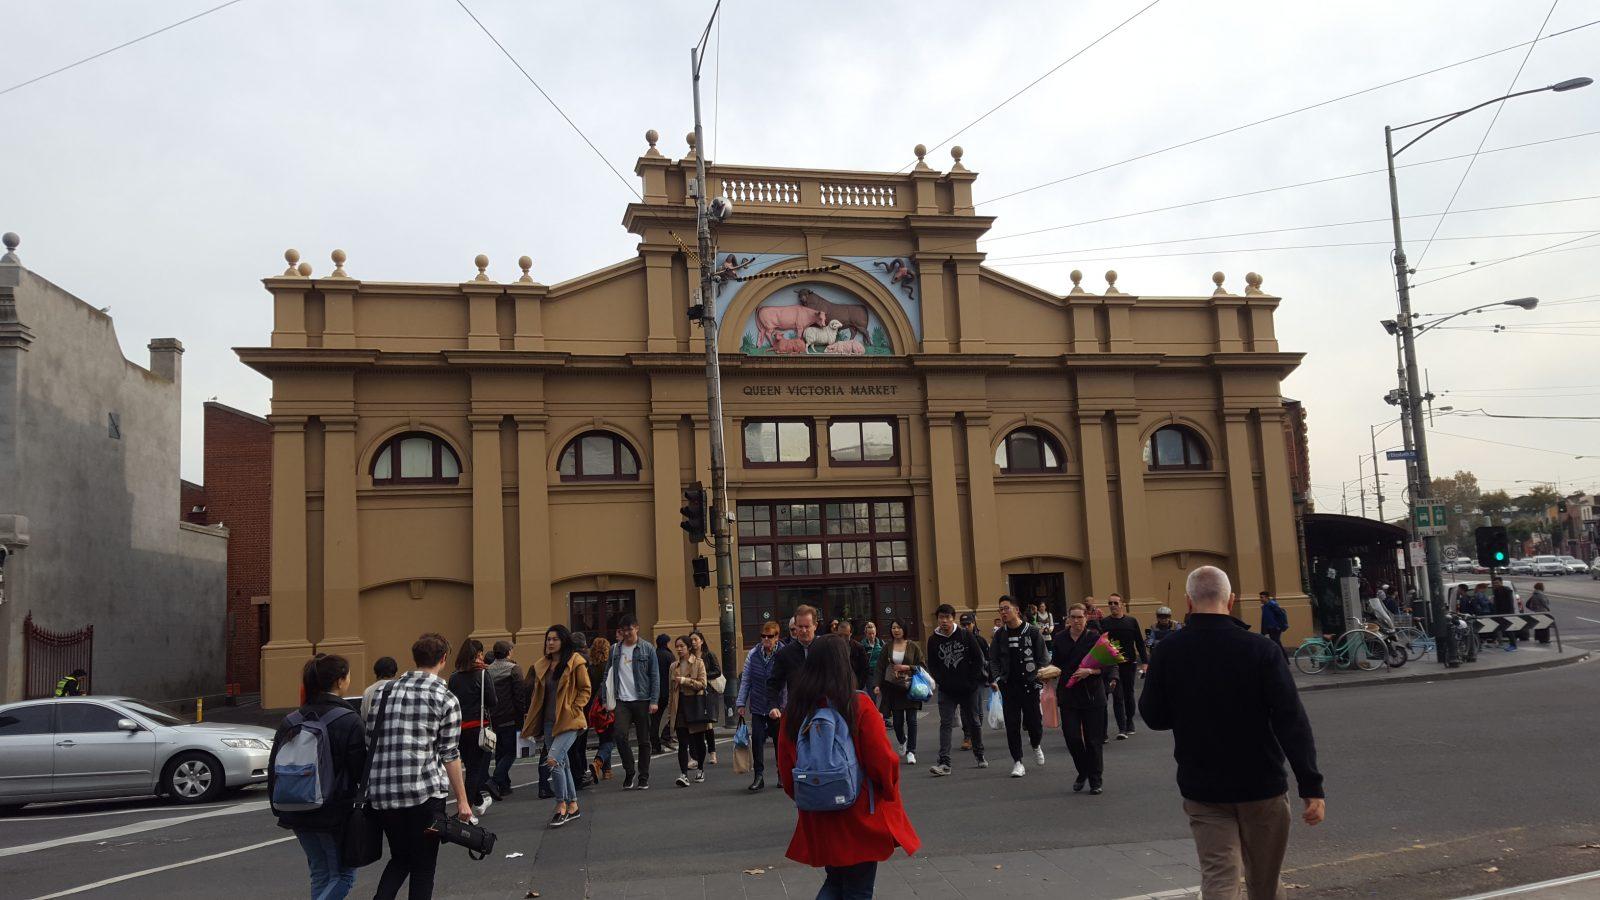 Queen Victoria Market façade